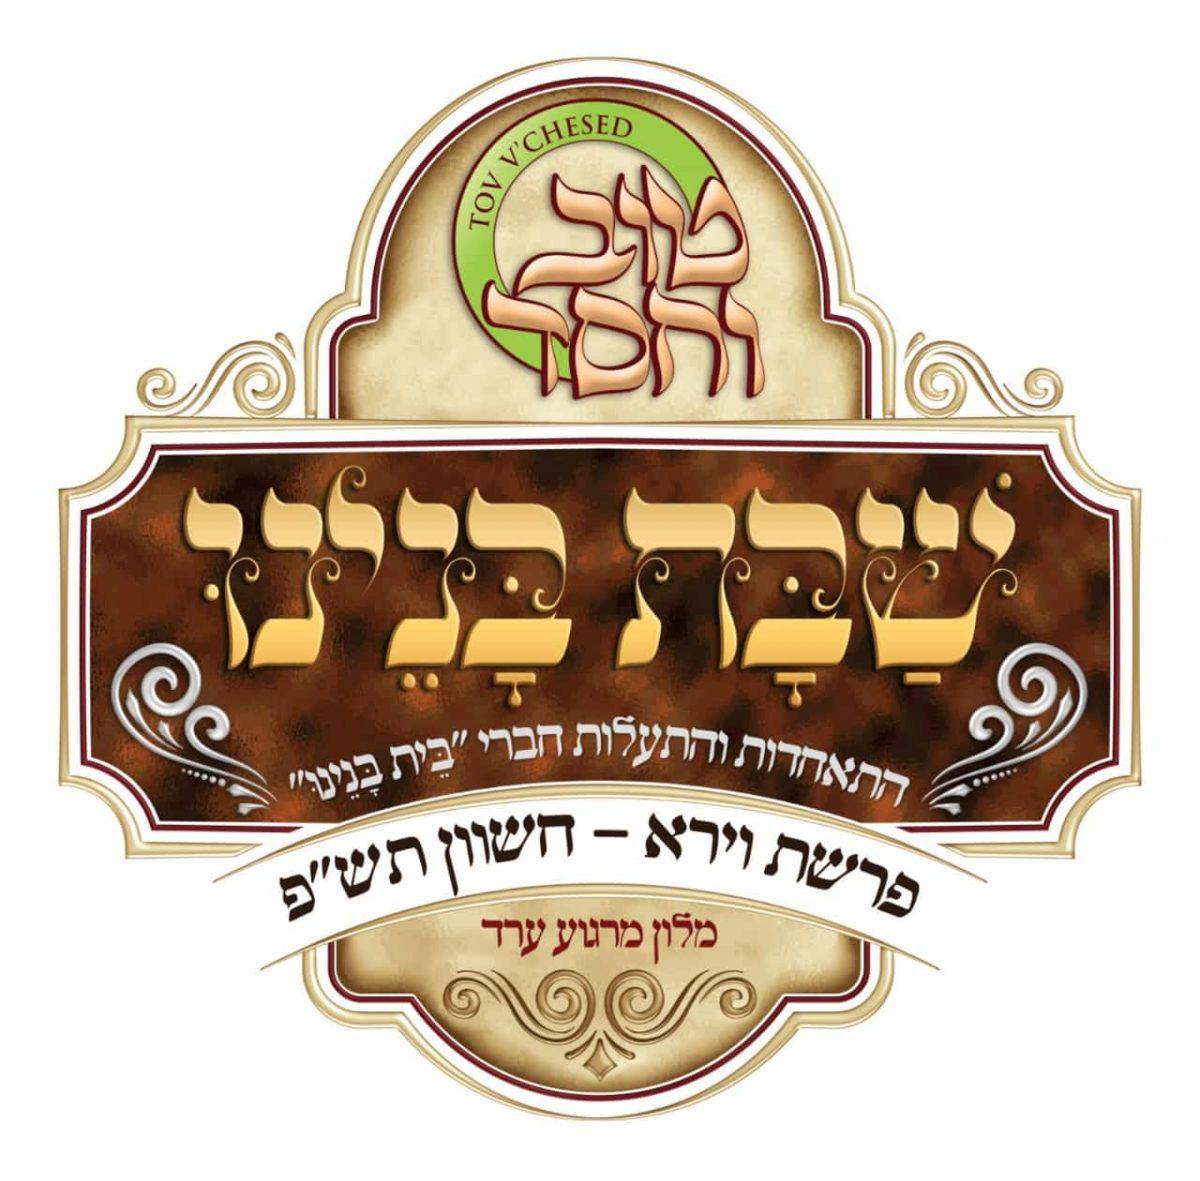 Over 400 Yesomim Take Part in Massive Shabbos Buneinu in Arad, Israel